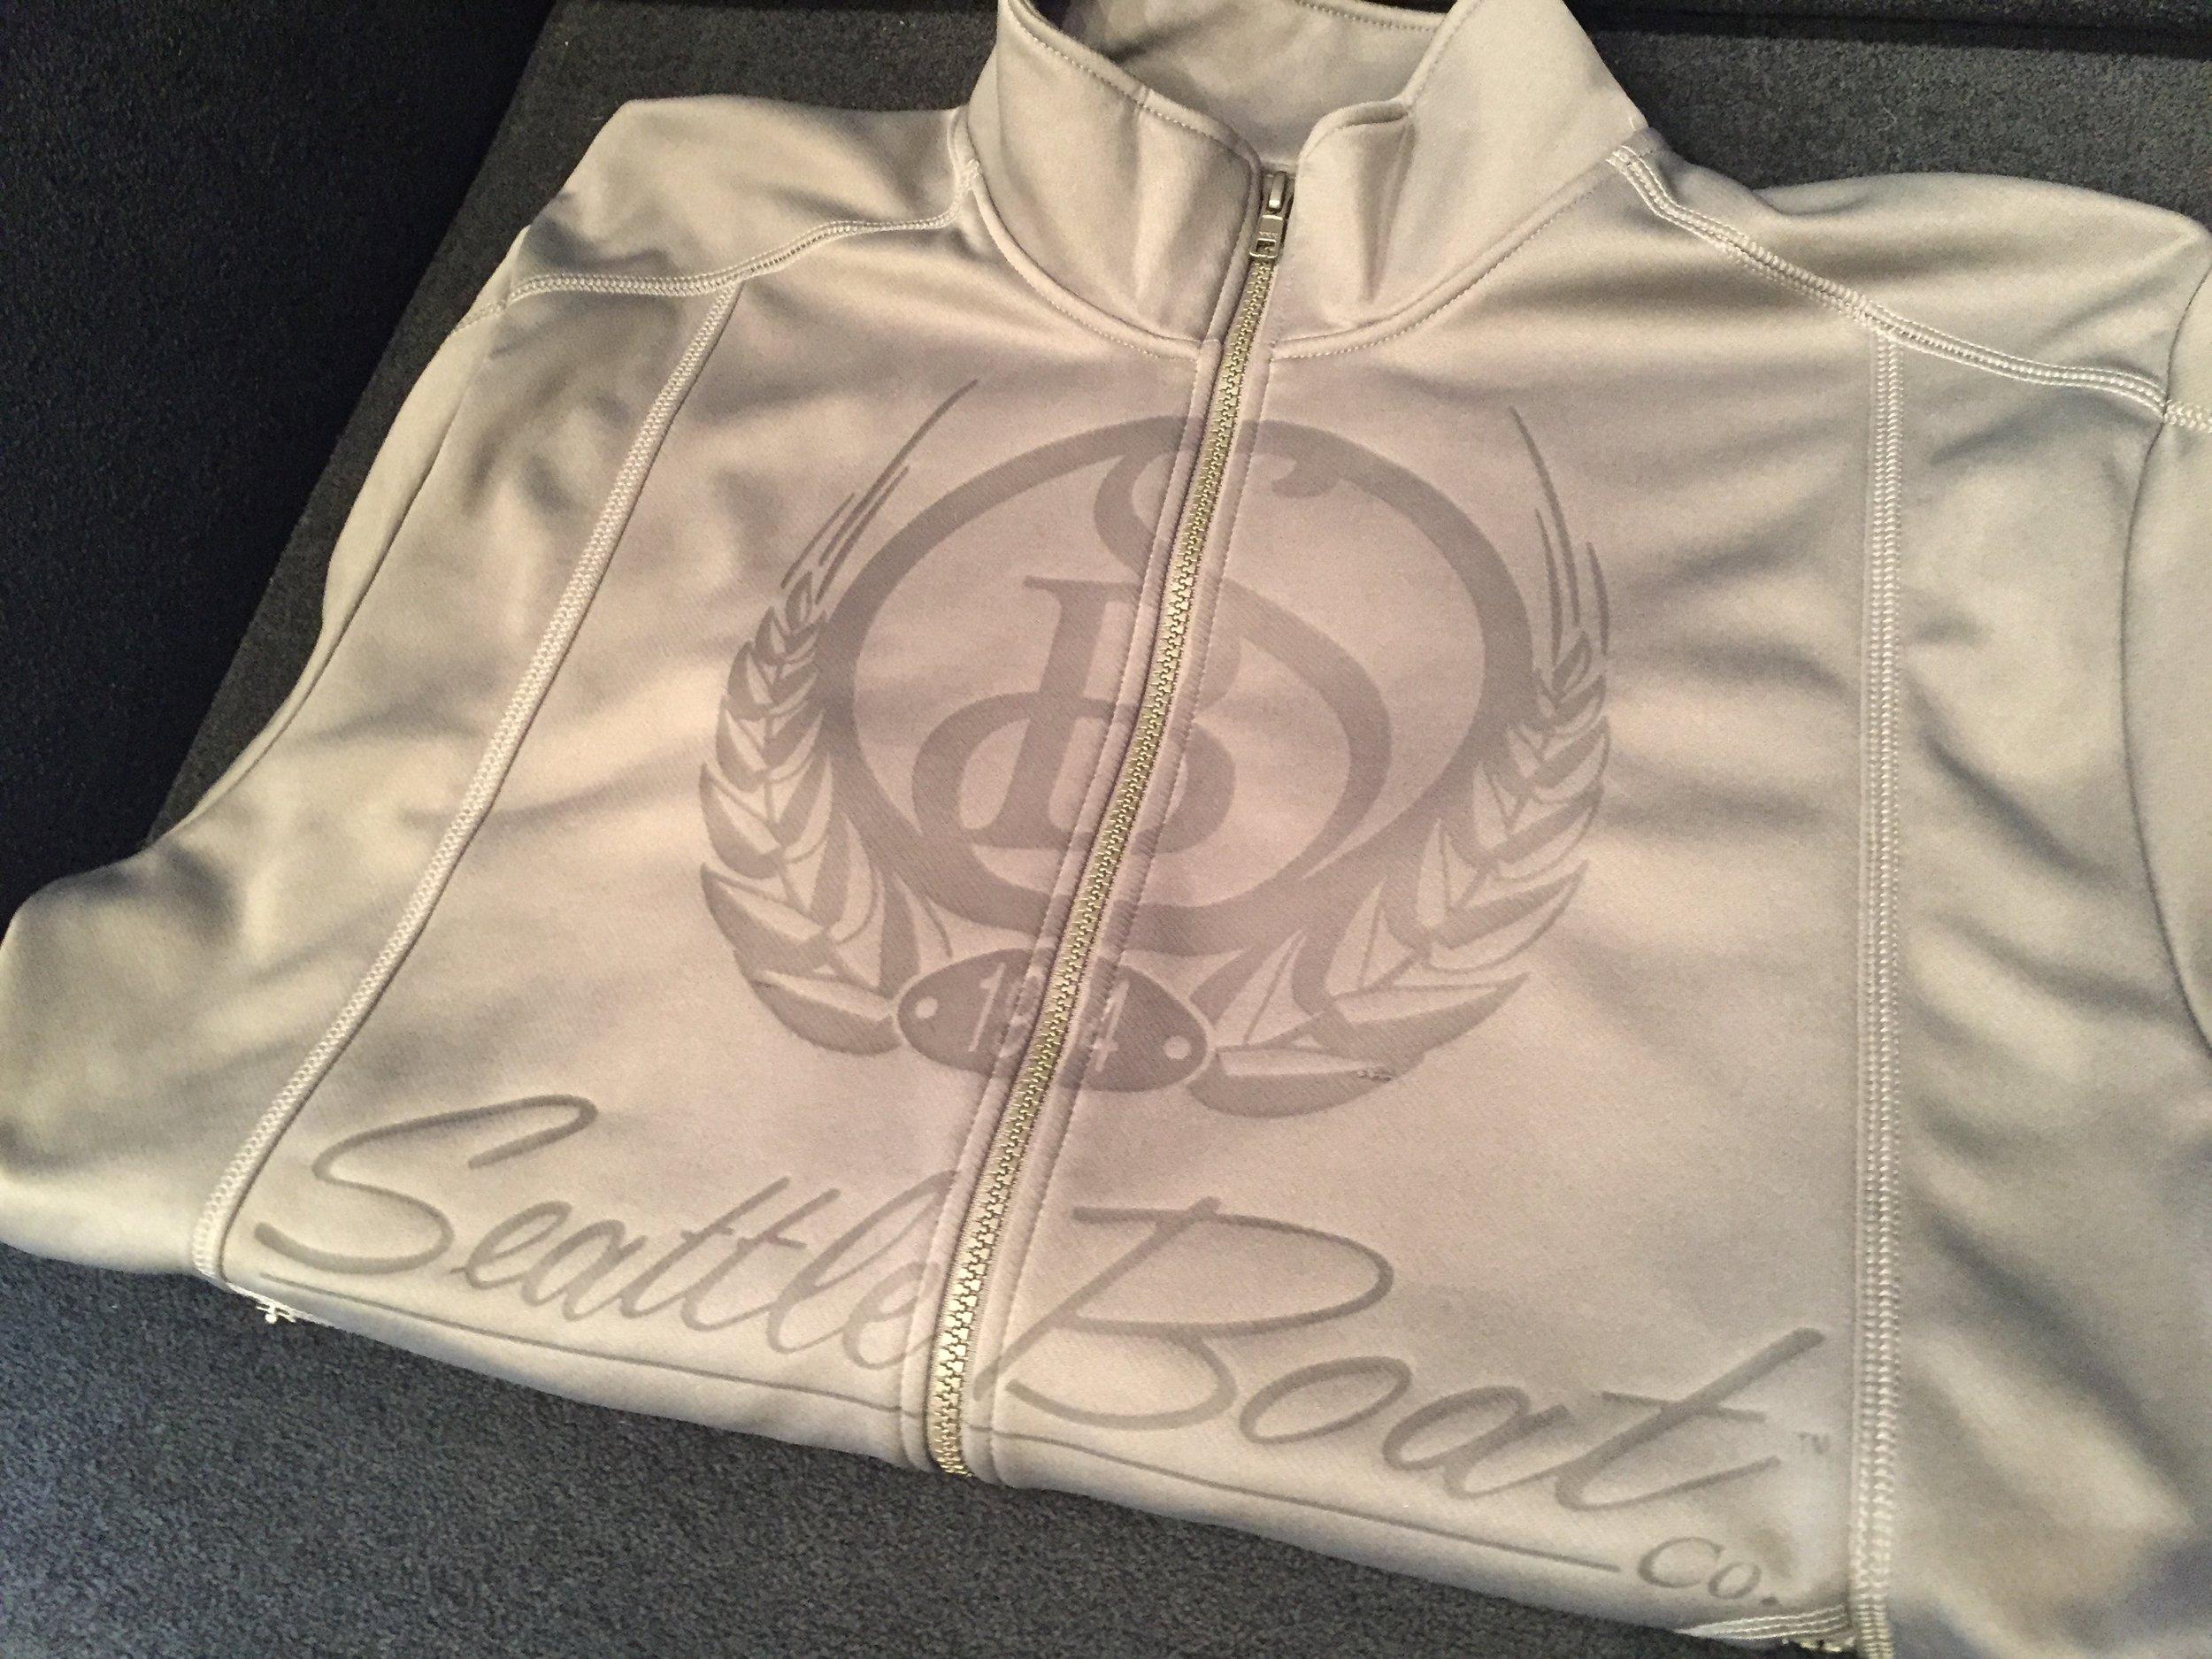 logounltd_laser_etching_embroidery_screen_printing_apparel_uniform_custom_tshirts_kirkland_bellevue_seattle_redmond_woodinville_branded_merchandise_promotional_products_logo_unltd_ tshirts_design_custom (37).JPG